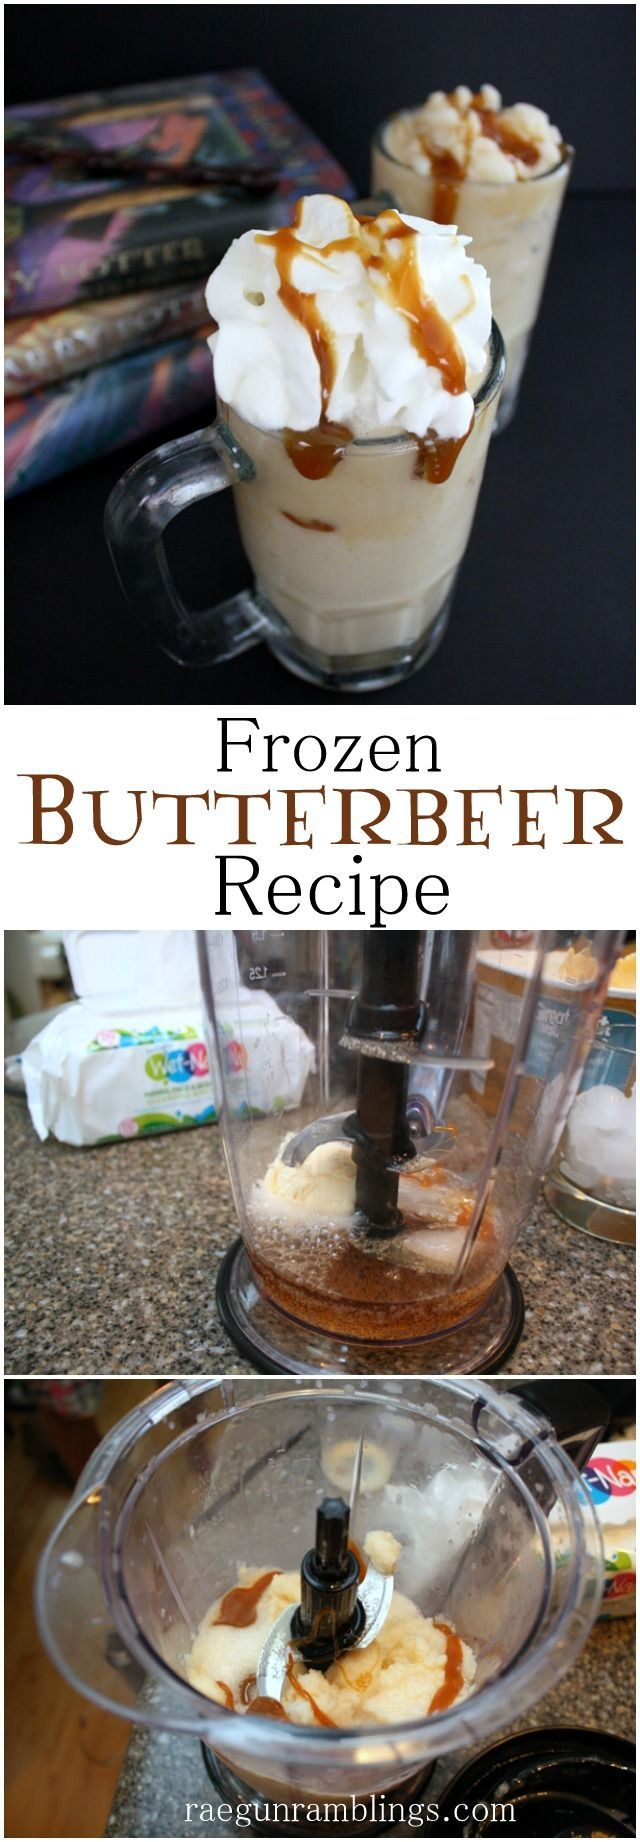 Delicious Frozen Butterbeer recipe just like Potterland - Rae Gun Ramblings